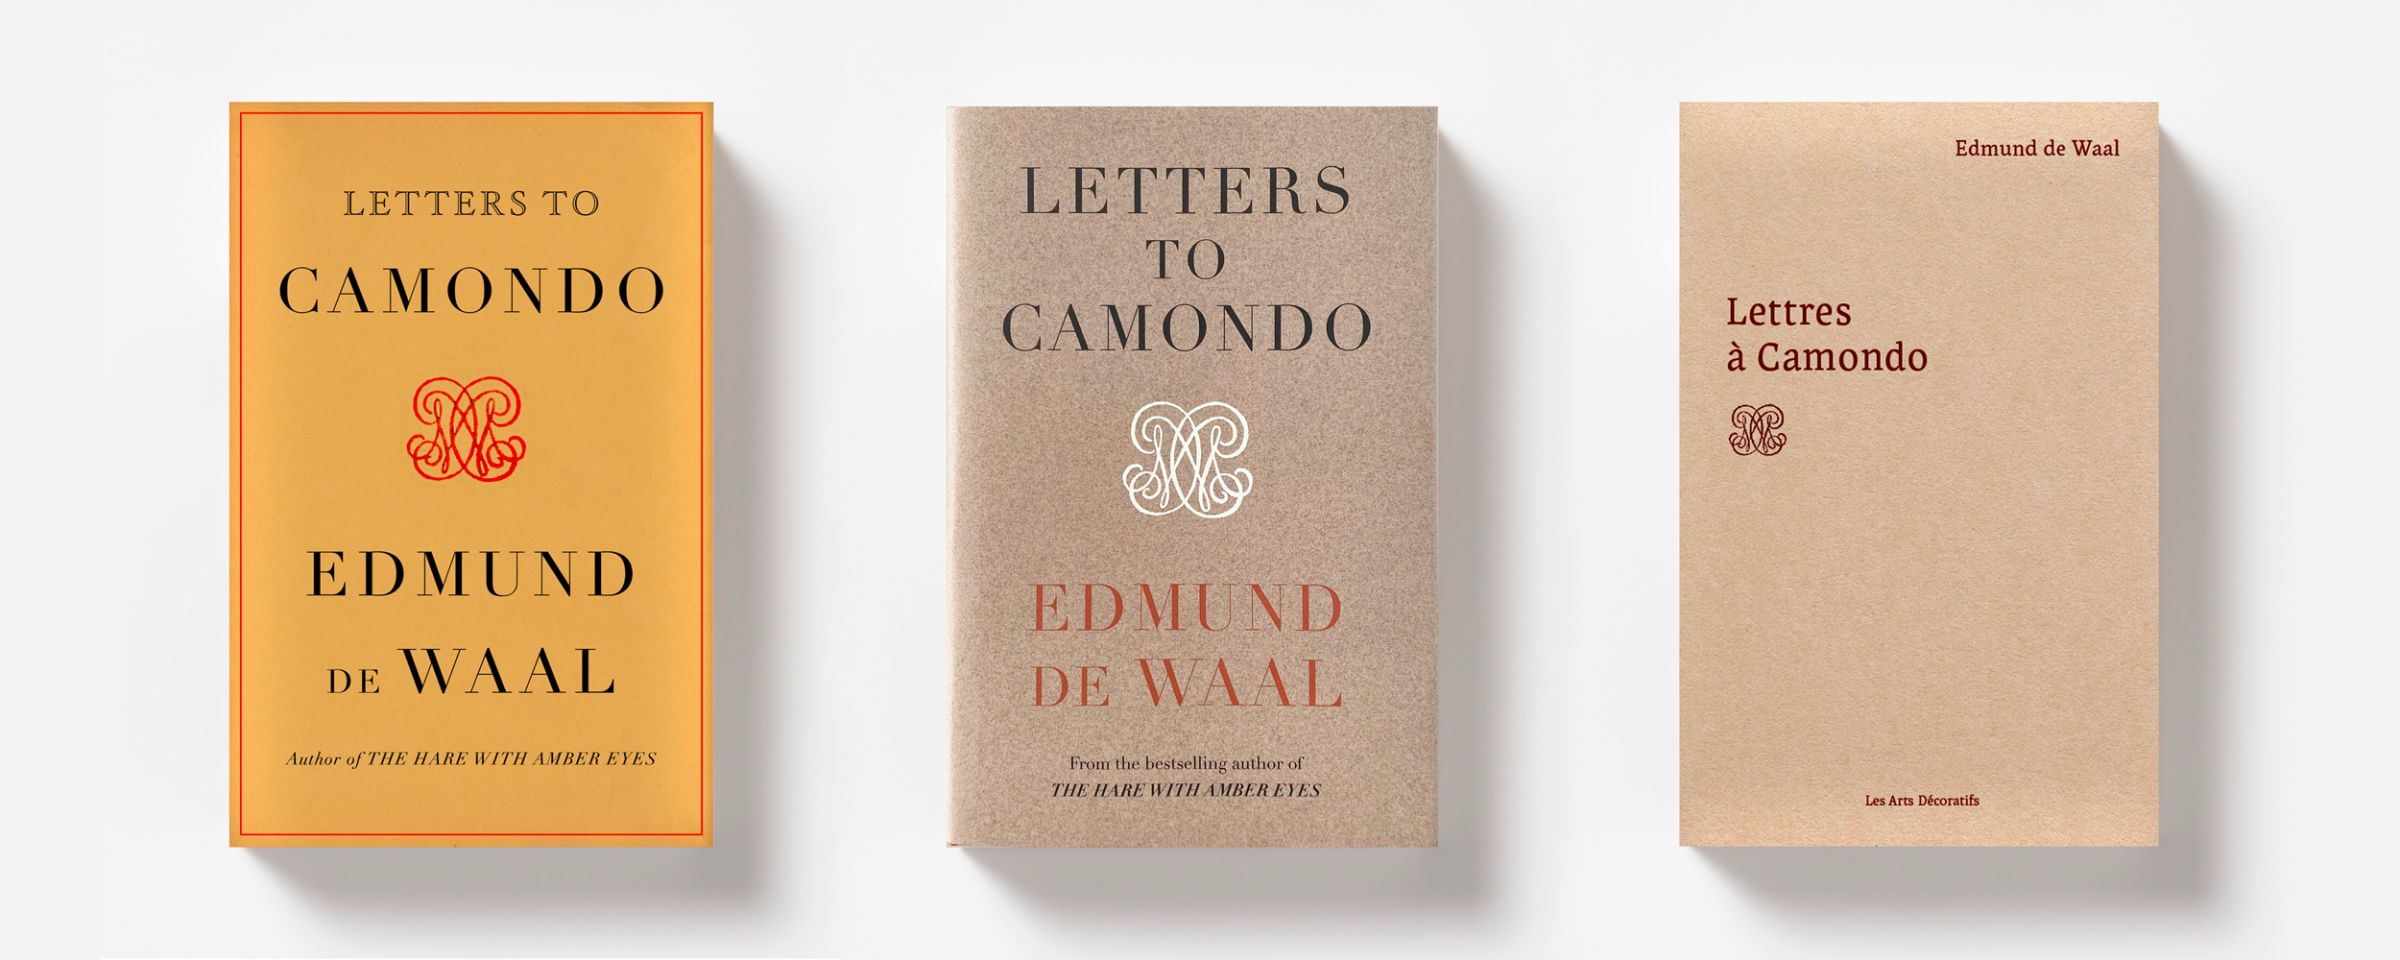 Edmund de Waal letters to Camondo editions